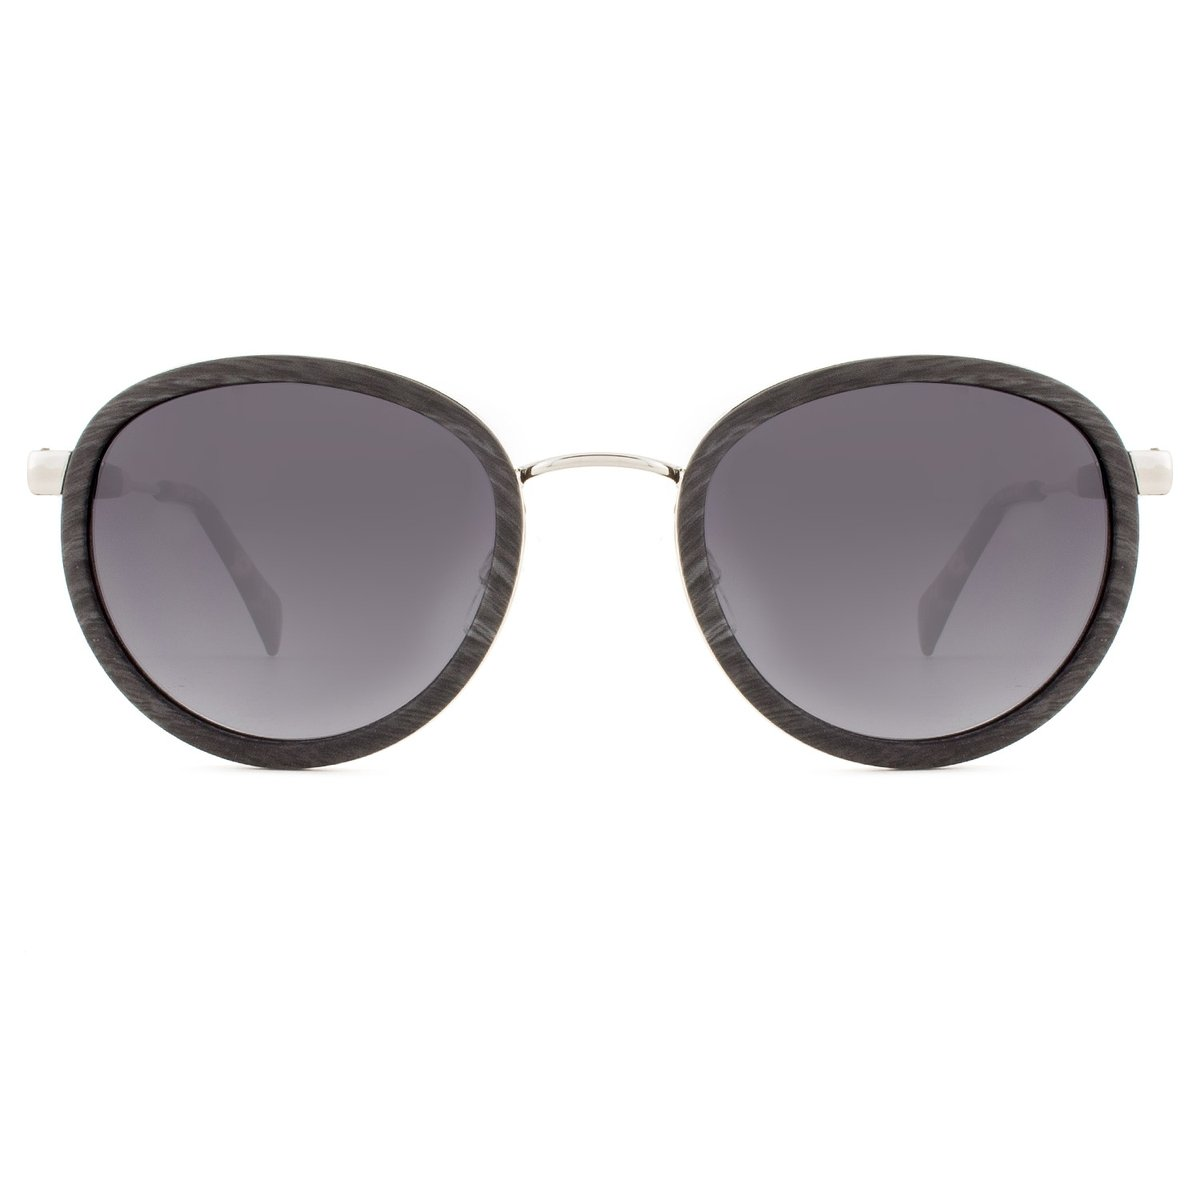 1a9d3a24e6c62 Óculos Tommy Hilfiger TH1307 S WJQ9 50 - Compre Agora   Netshoes